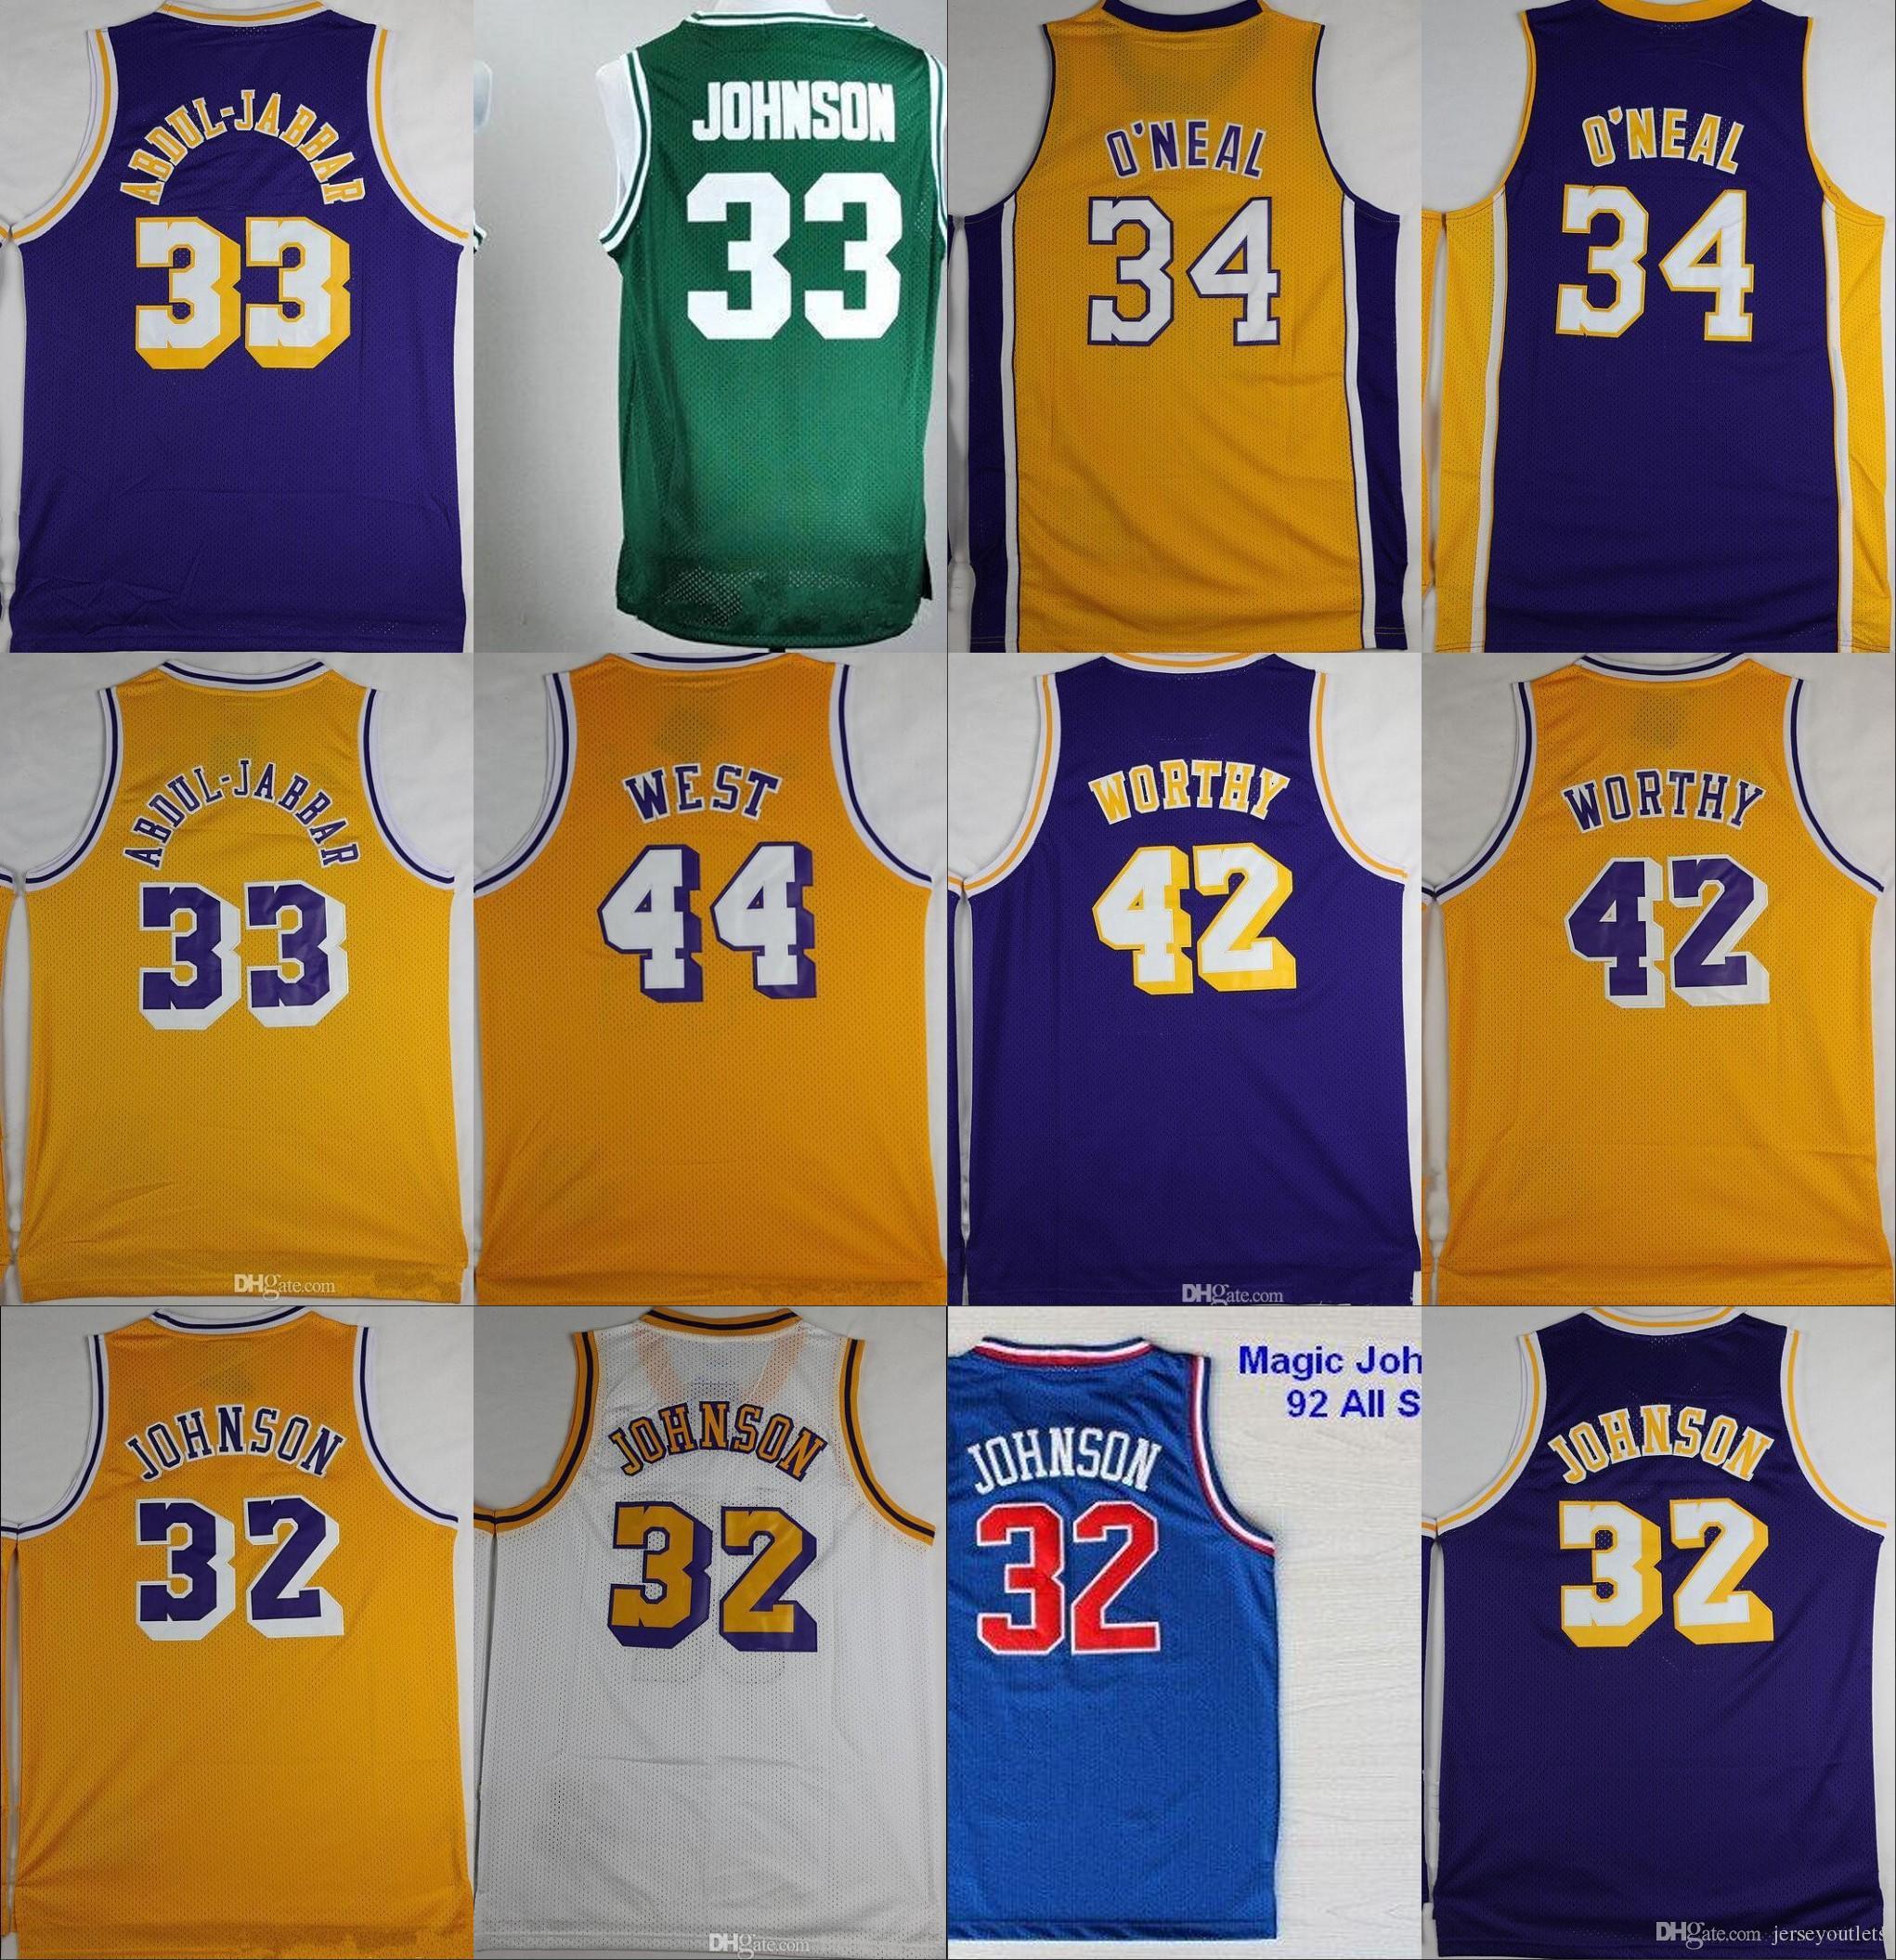 307c5b57bca ... jersey 33 basketball psadna certified c7c0b 43b0f; where to buy 32  magic johnson 33 kareem abdul jabbar 34 shaquille oneal 42 artest worthy